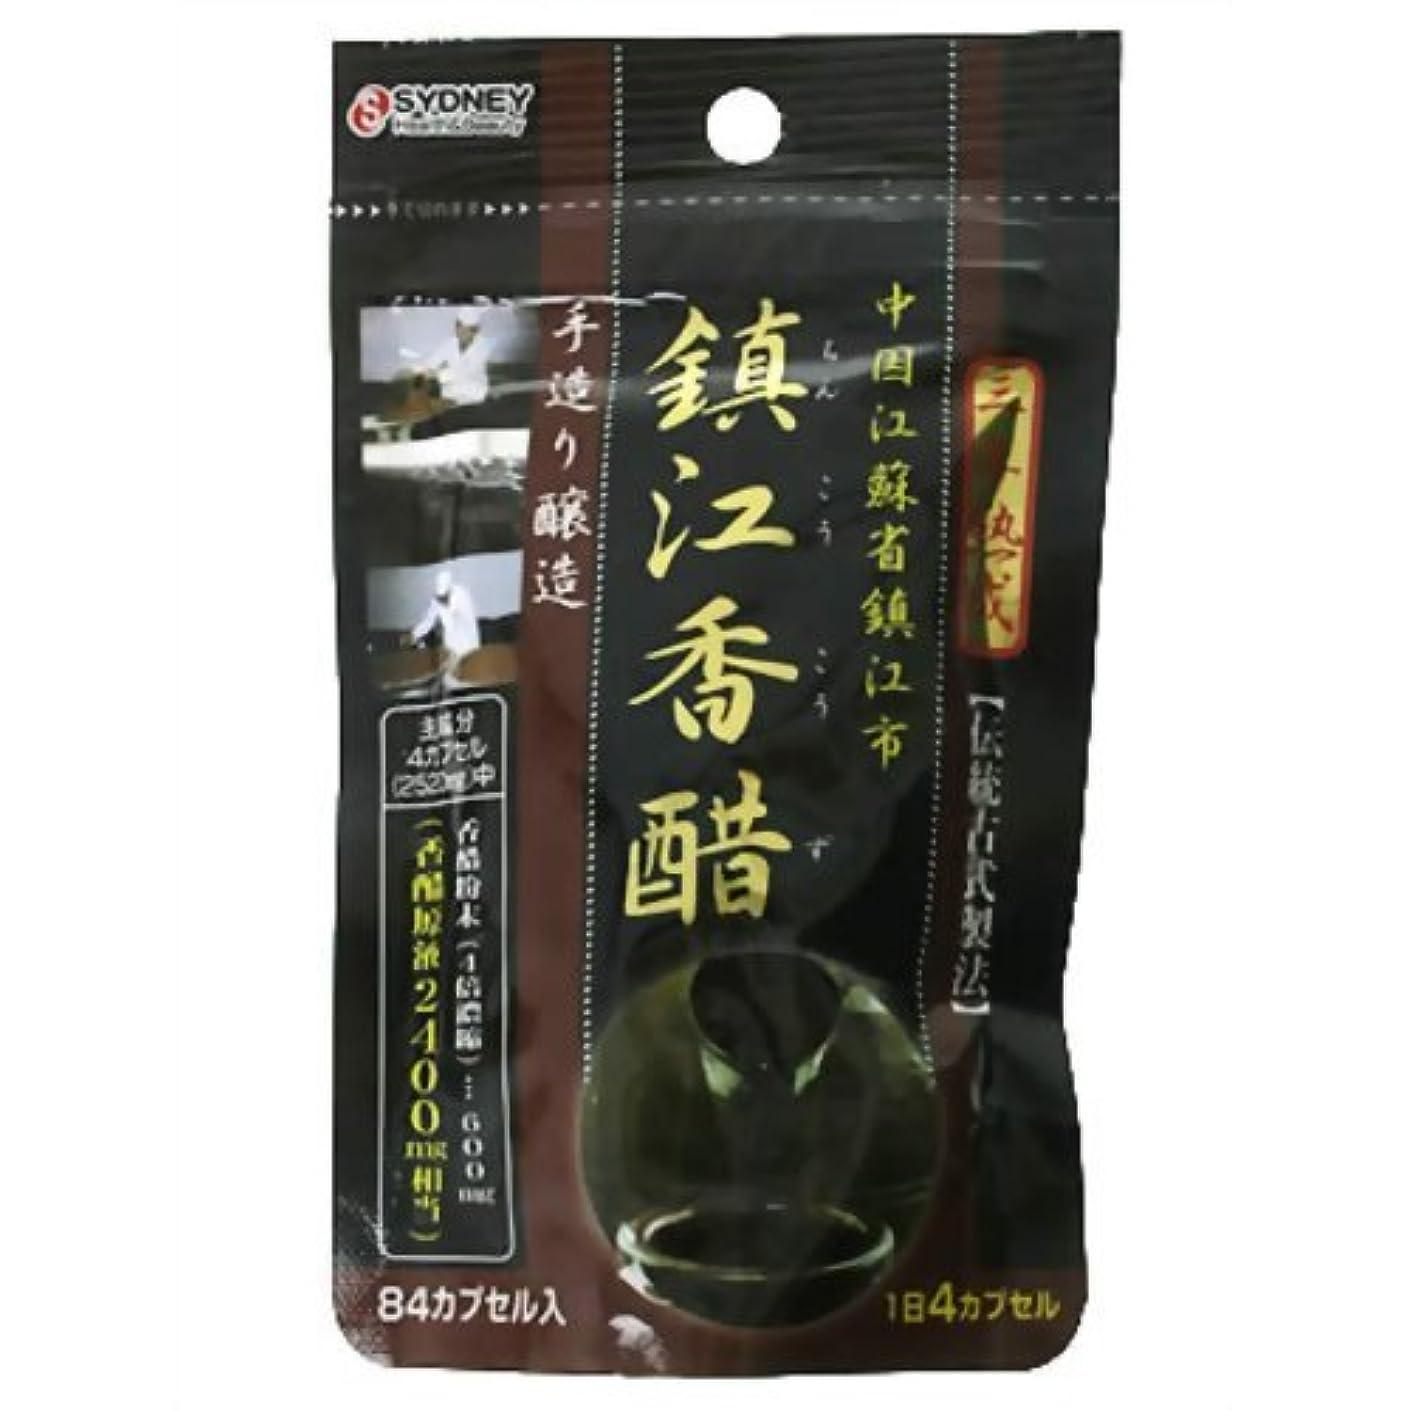 パイ獣靴鎮江香酢(三年熟成?伝統古式製法) 84カプセル